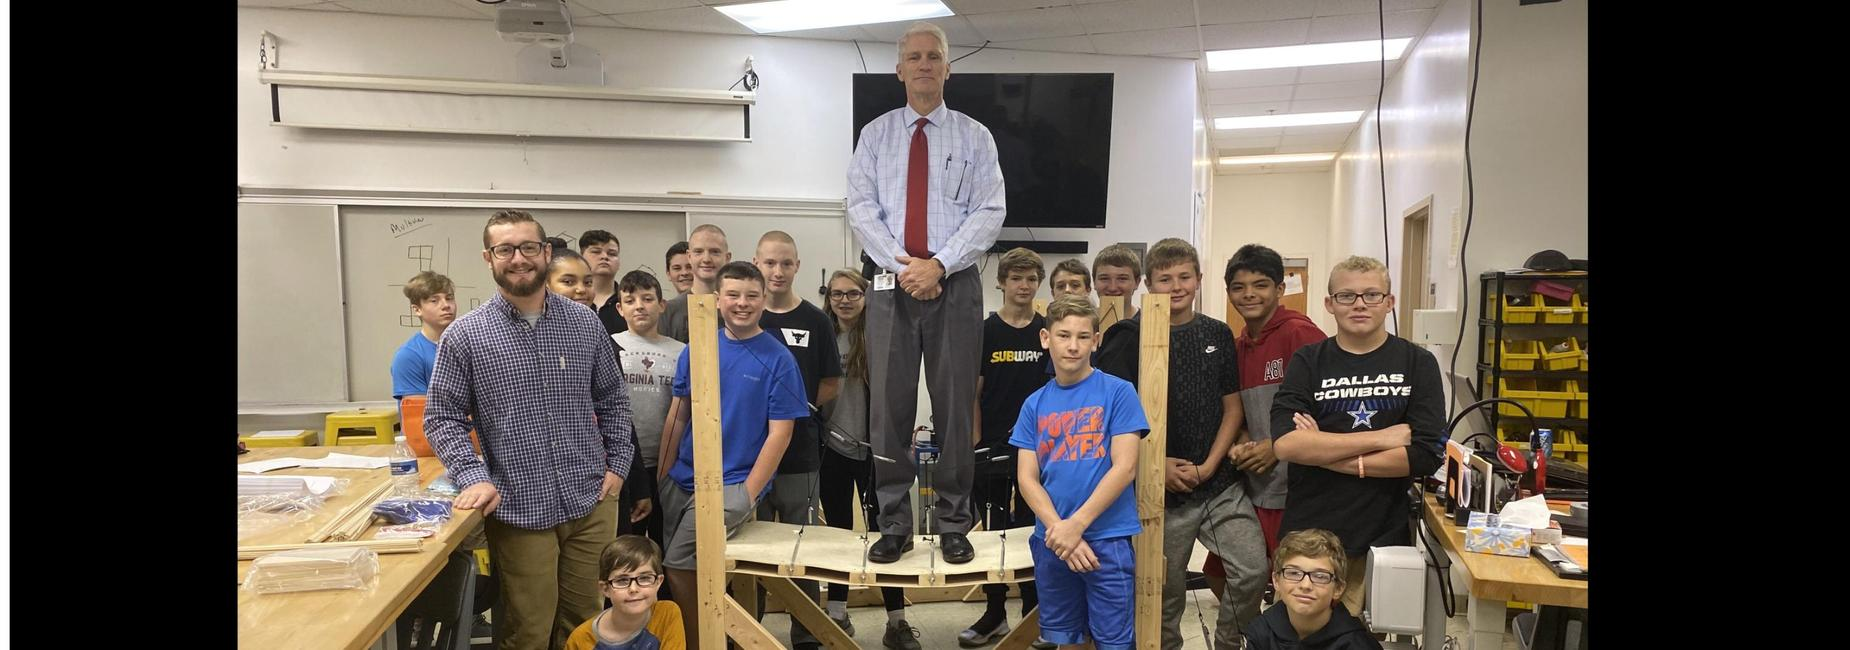 Mr. Blevins on a bridge built by Mr. Pierce's technology class.